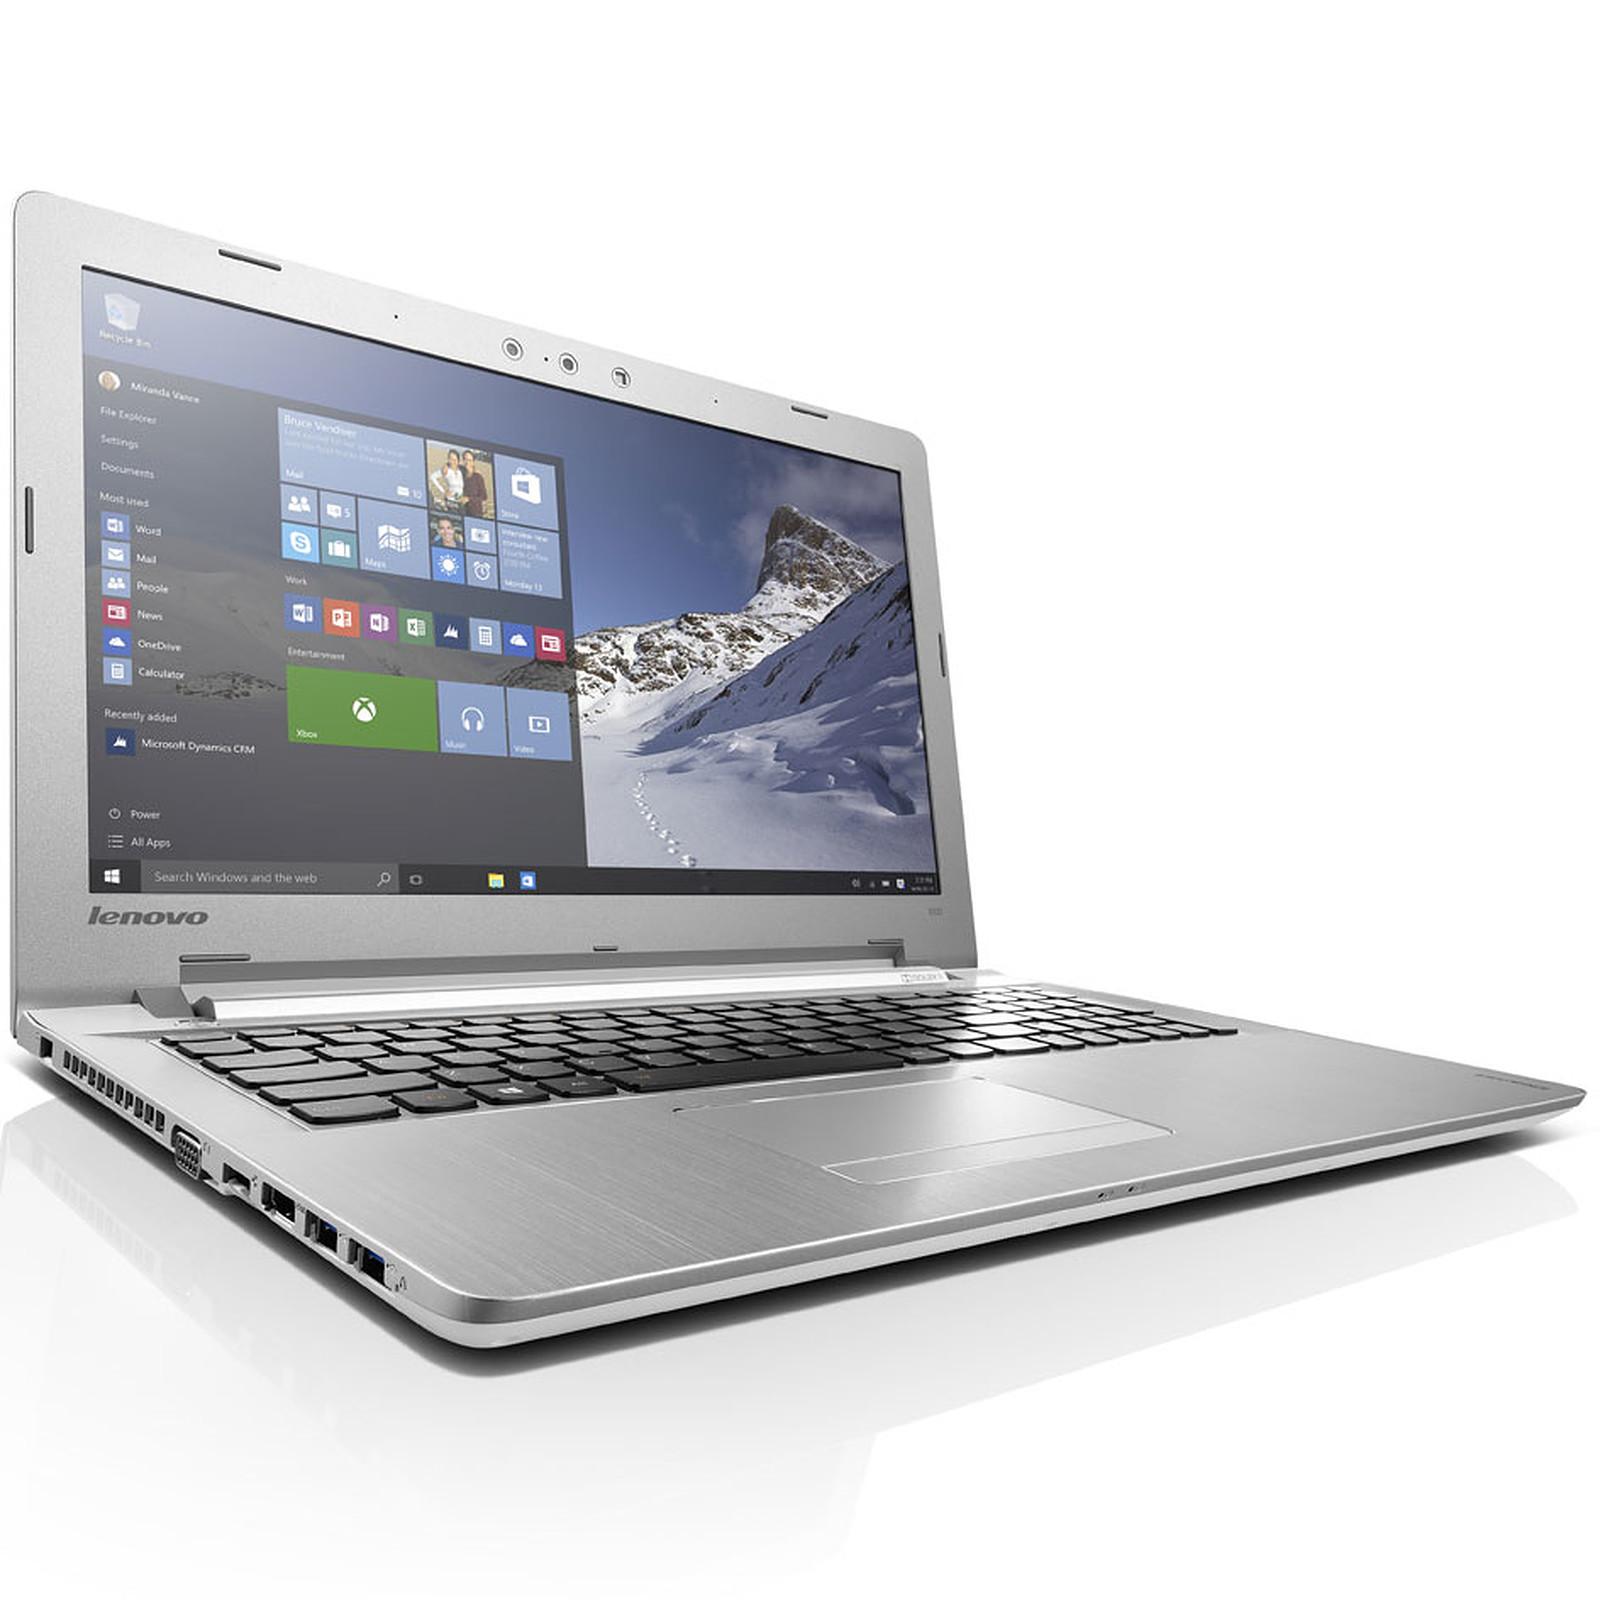 Lenovo IdeaPad 500 (80NT00GHFR)